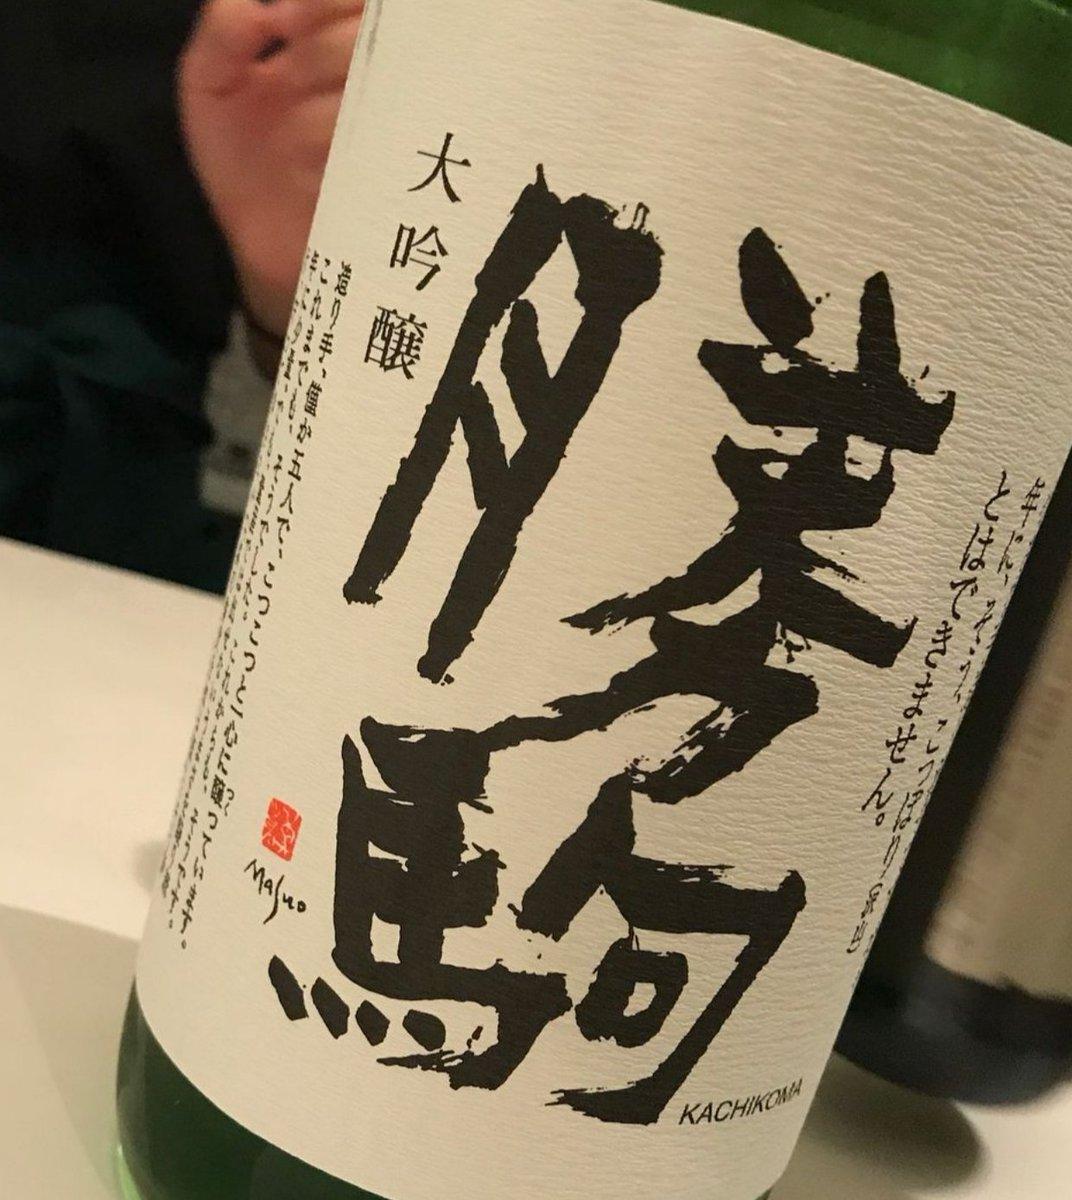 test ツイッターメディア - 誕生日プレゼント🎁に  日本酒🍶貰った✨  勝駒 https://t.co/zjNTdhzFlF